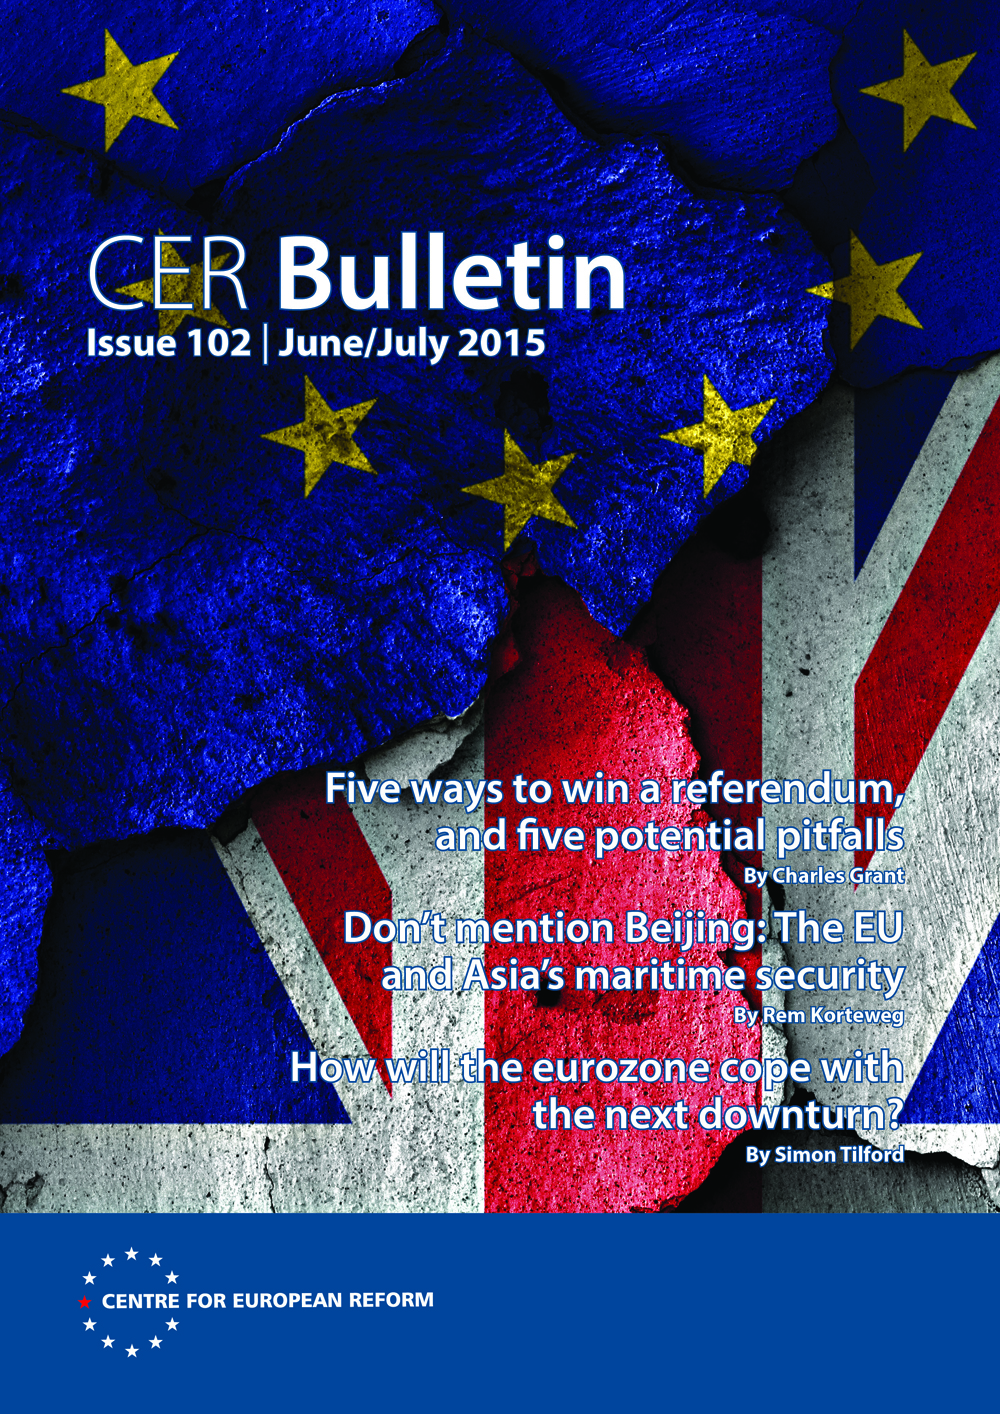 Bulletin issue 102 June/July 2015